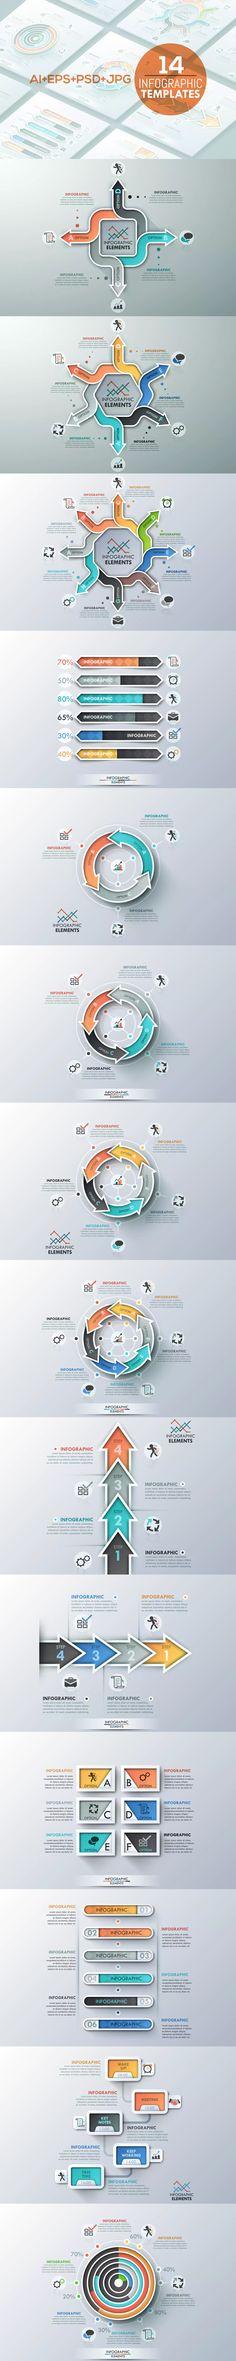 14 Infographic Templates AI, EPS, PSD